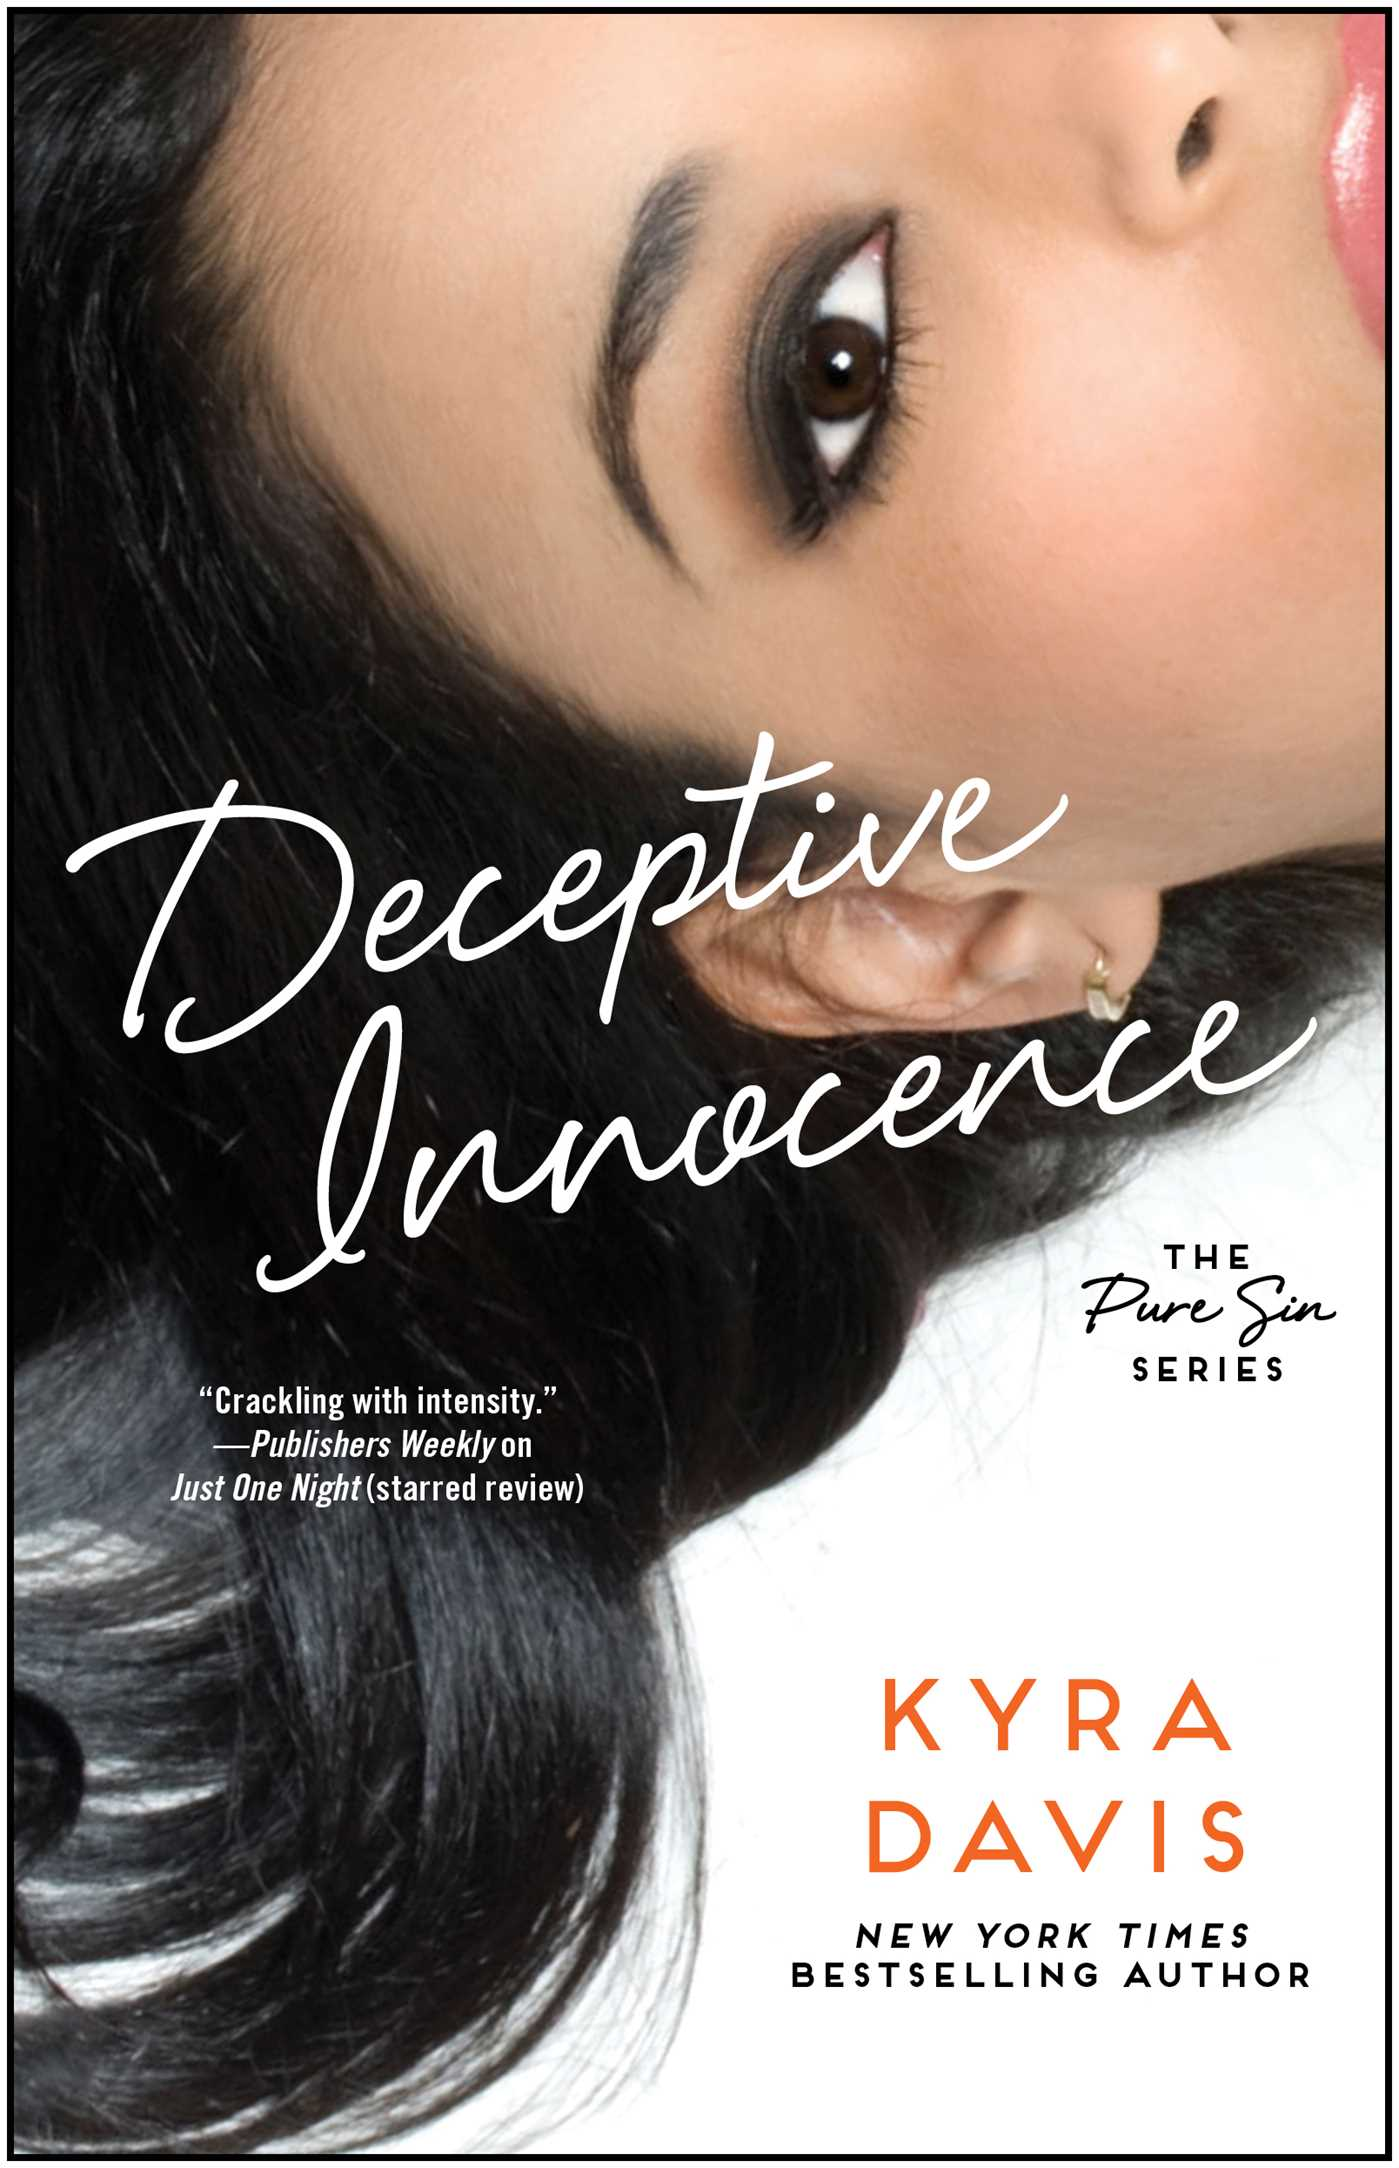 Deceptive innocence 9781476756318 hr